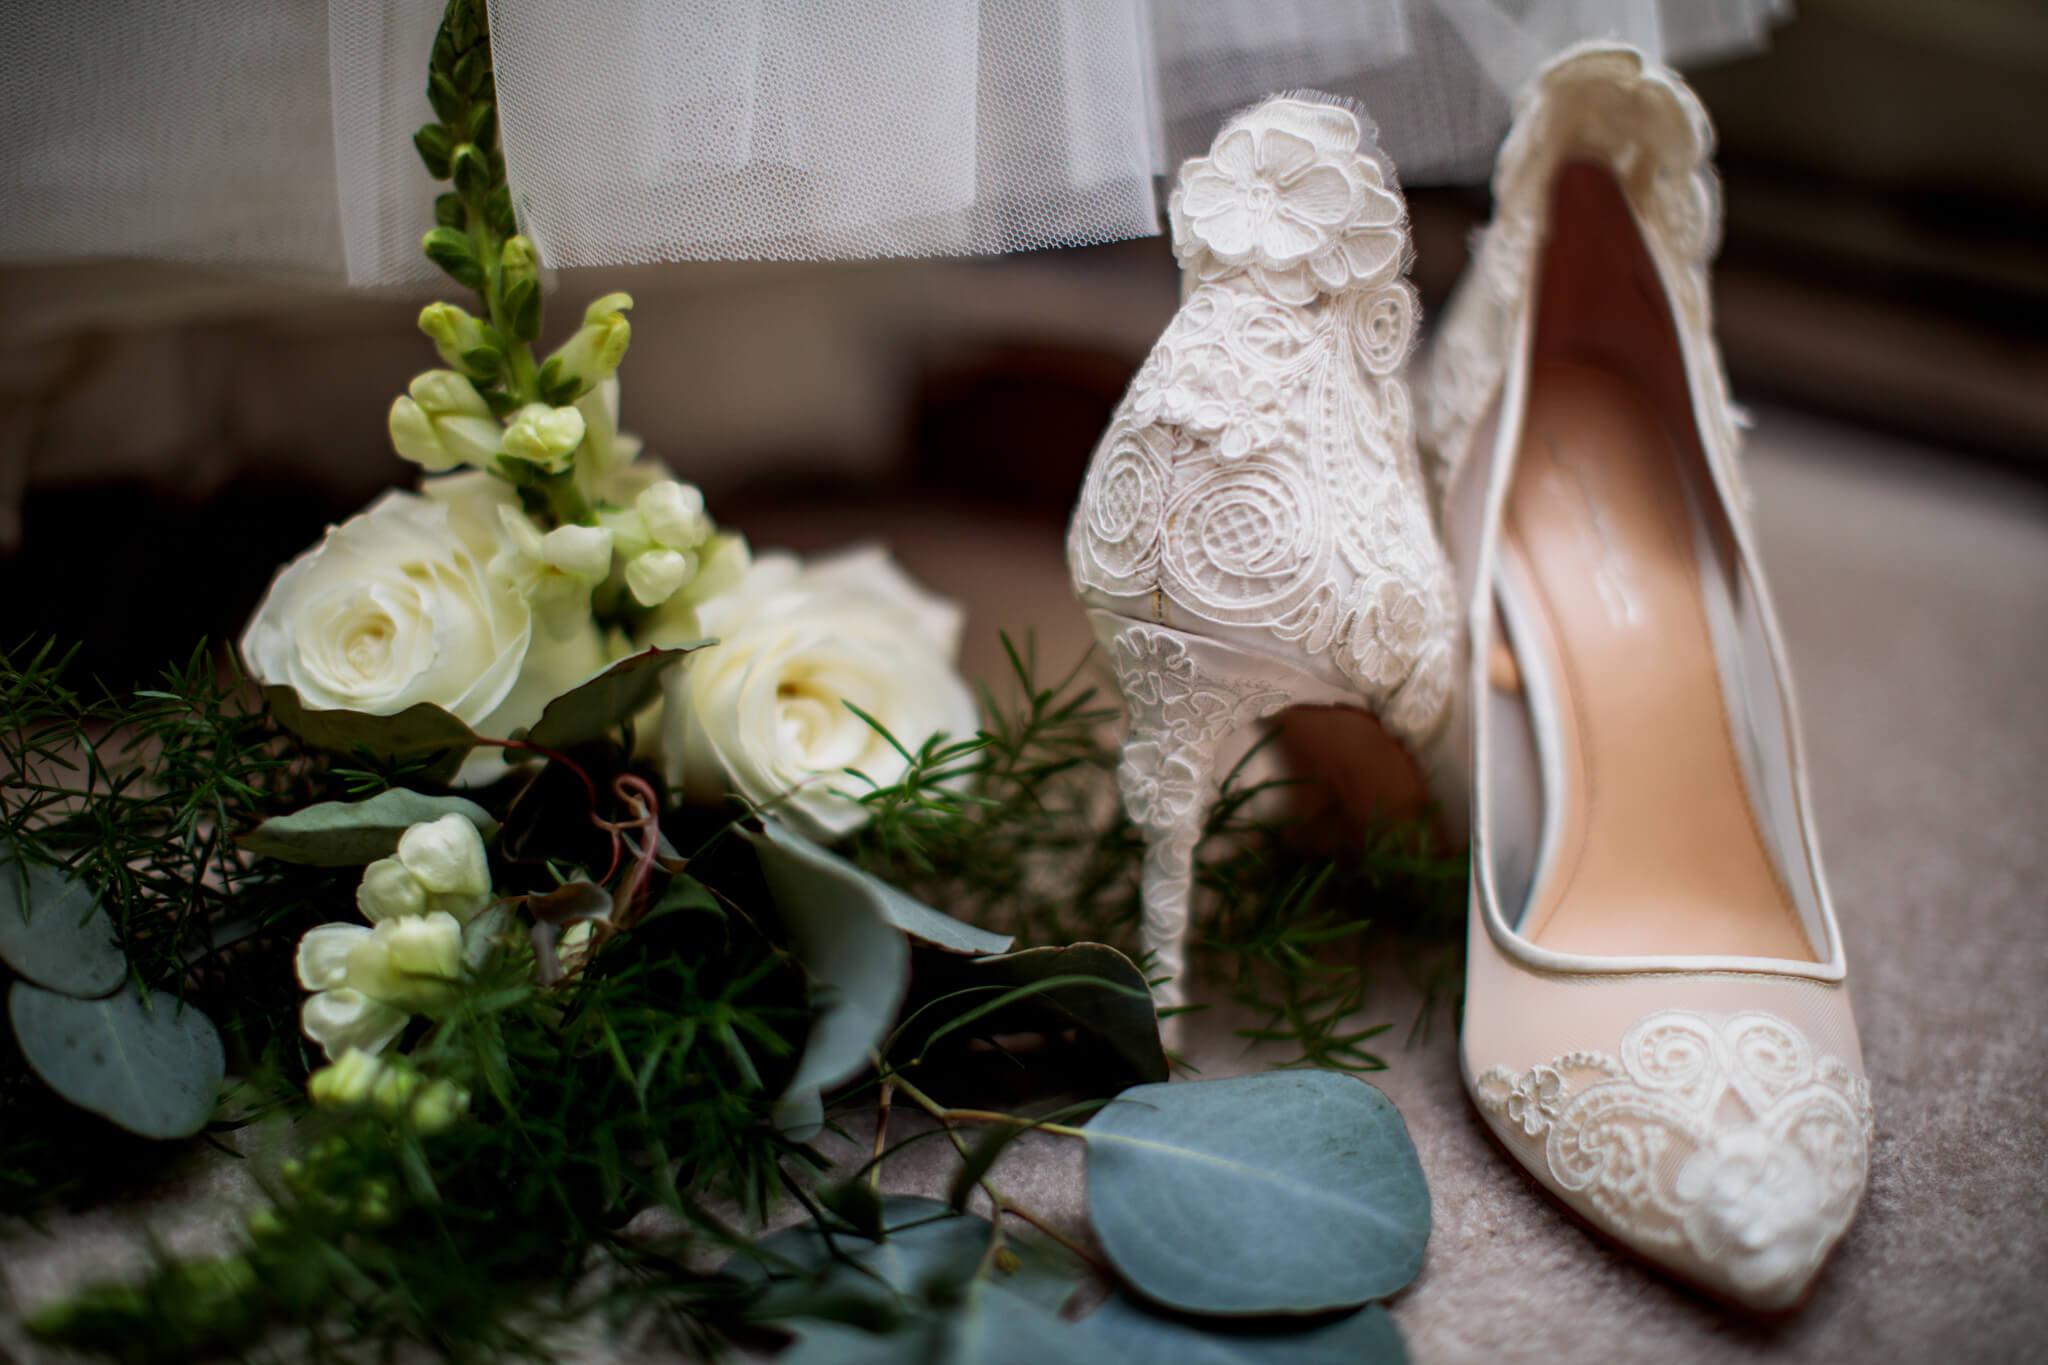 Alysia Jerad Homestead Blessings Farm Hershey PA Wedding Rustic Chique - 59.JPG